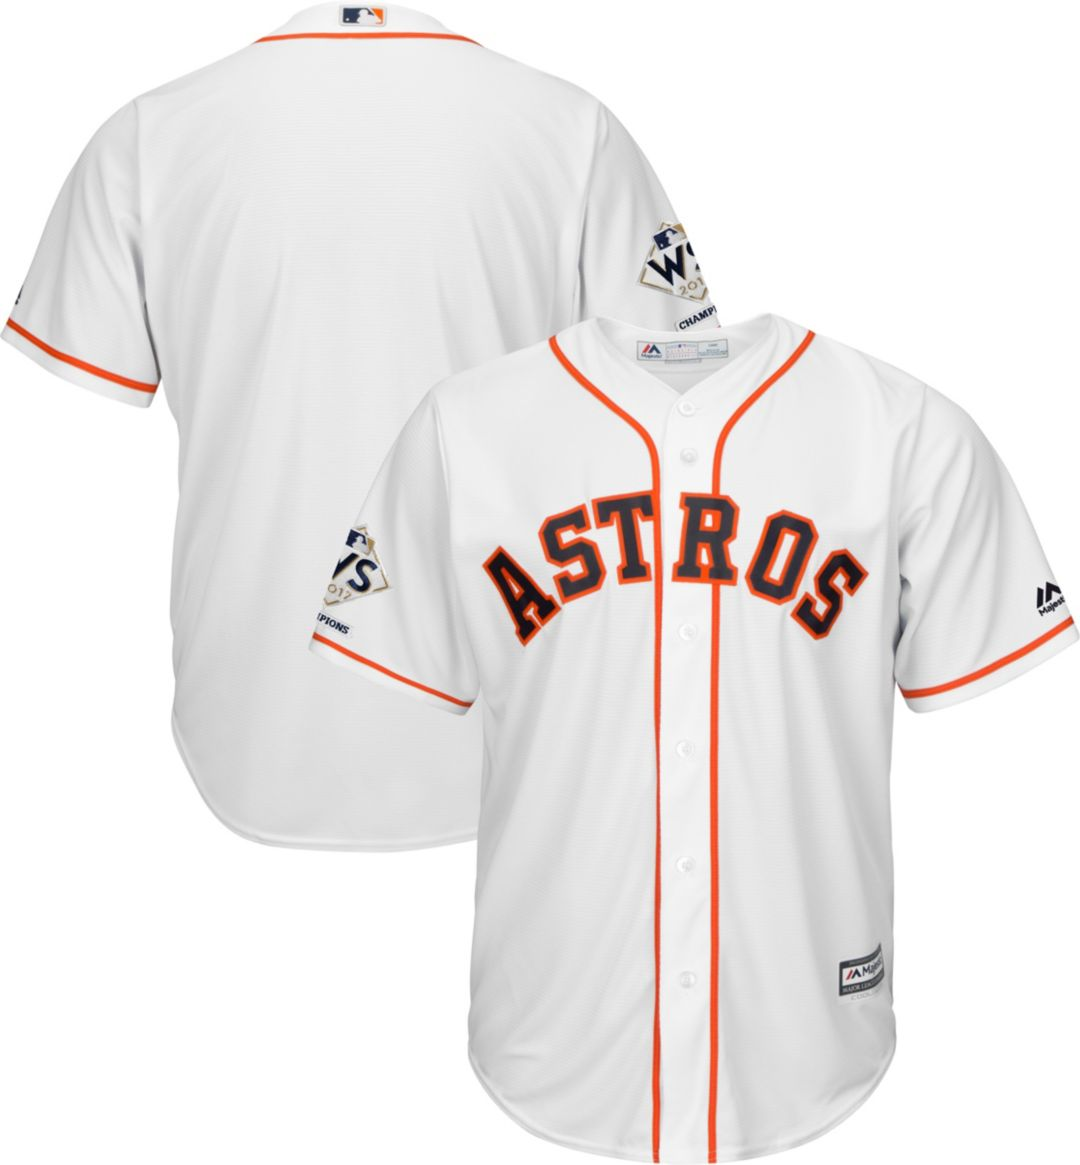 e88d3248b Majestic Men's 2017 World Series Champions Replica Houston Astros Cool Base  Home White Jersey 1